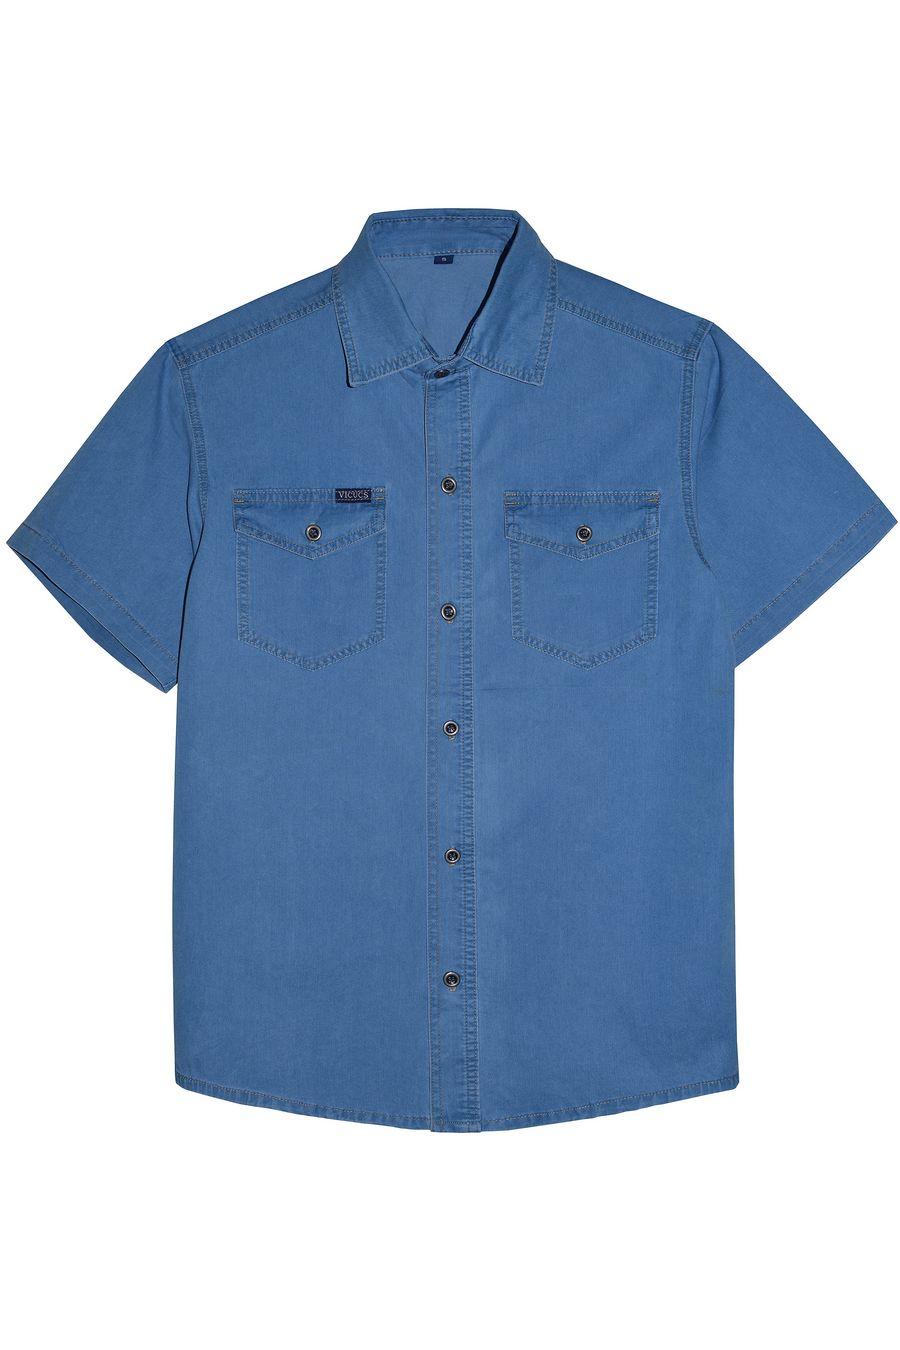 Рубашка мужская Vicucs 728E/CT-321-20 (XL-5XL) - фото 1